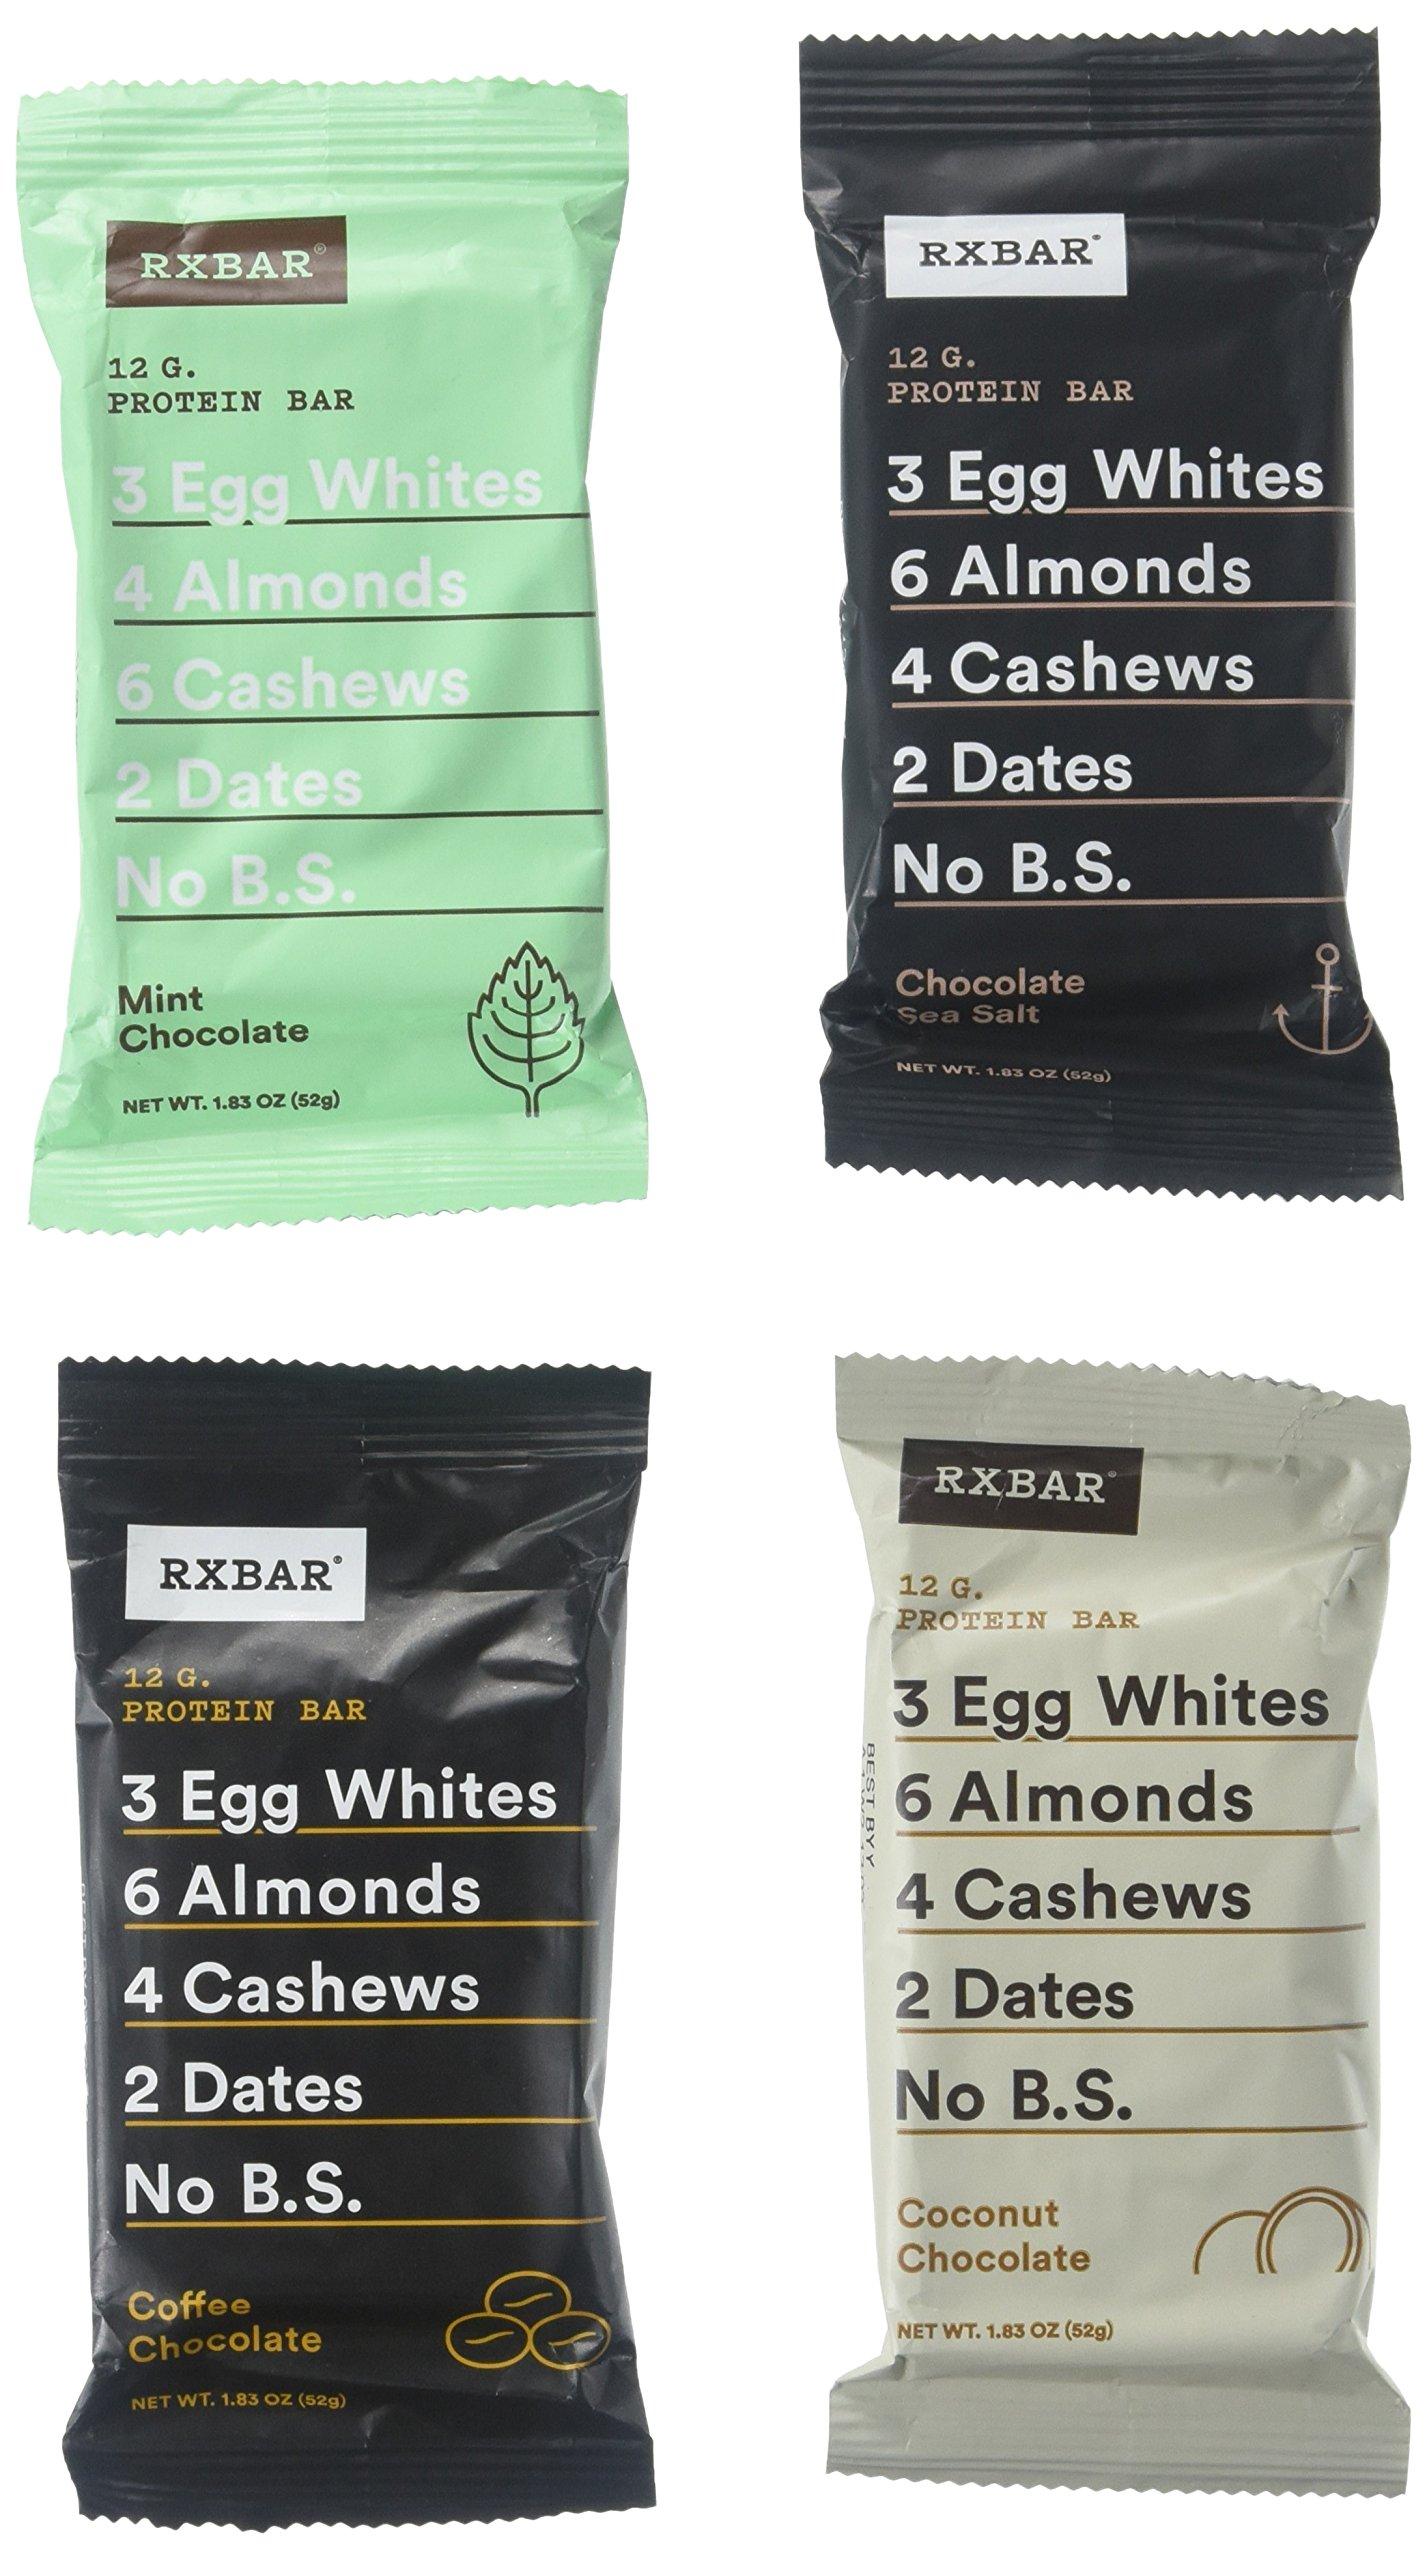 RxBar Real Food Protein Bars Chocolate Sampler (4 Pack). Chocolate Sea Salt, Chocolate Coconut, Chocolate Coffee, Chocolate Mint.